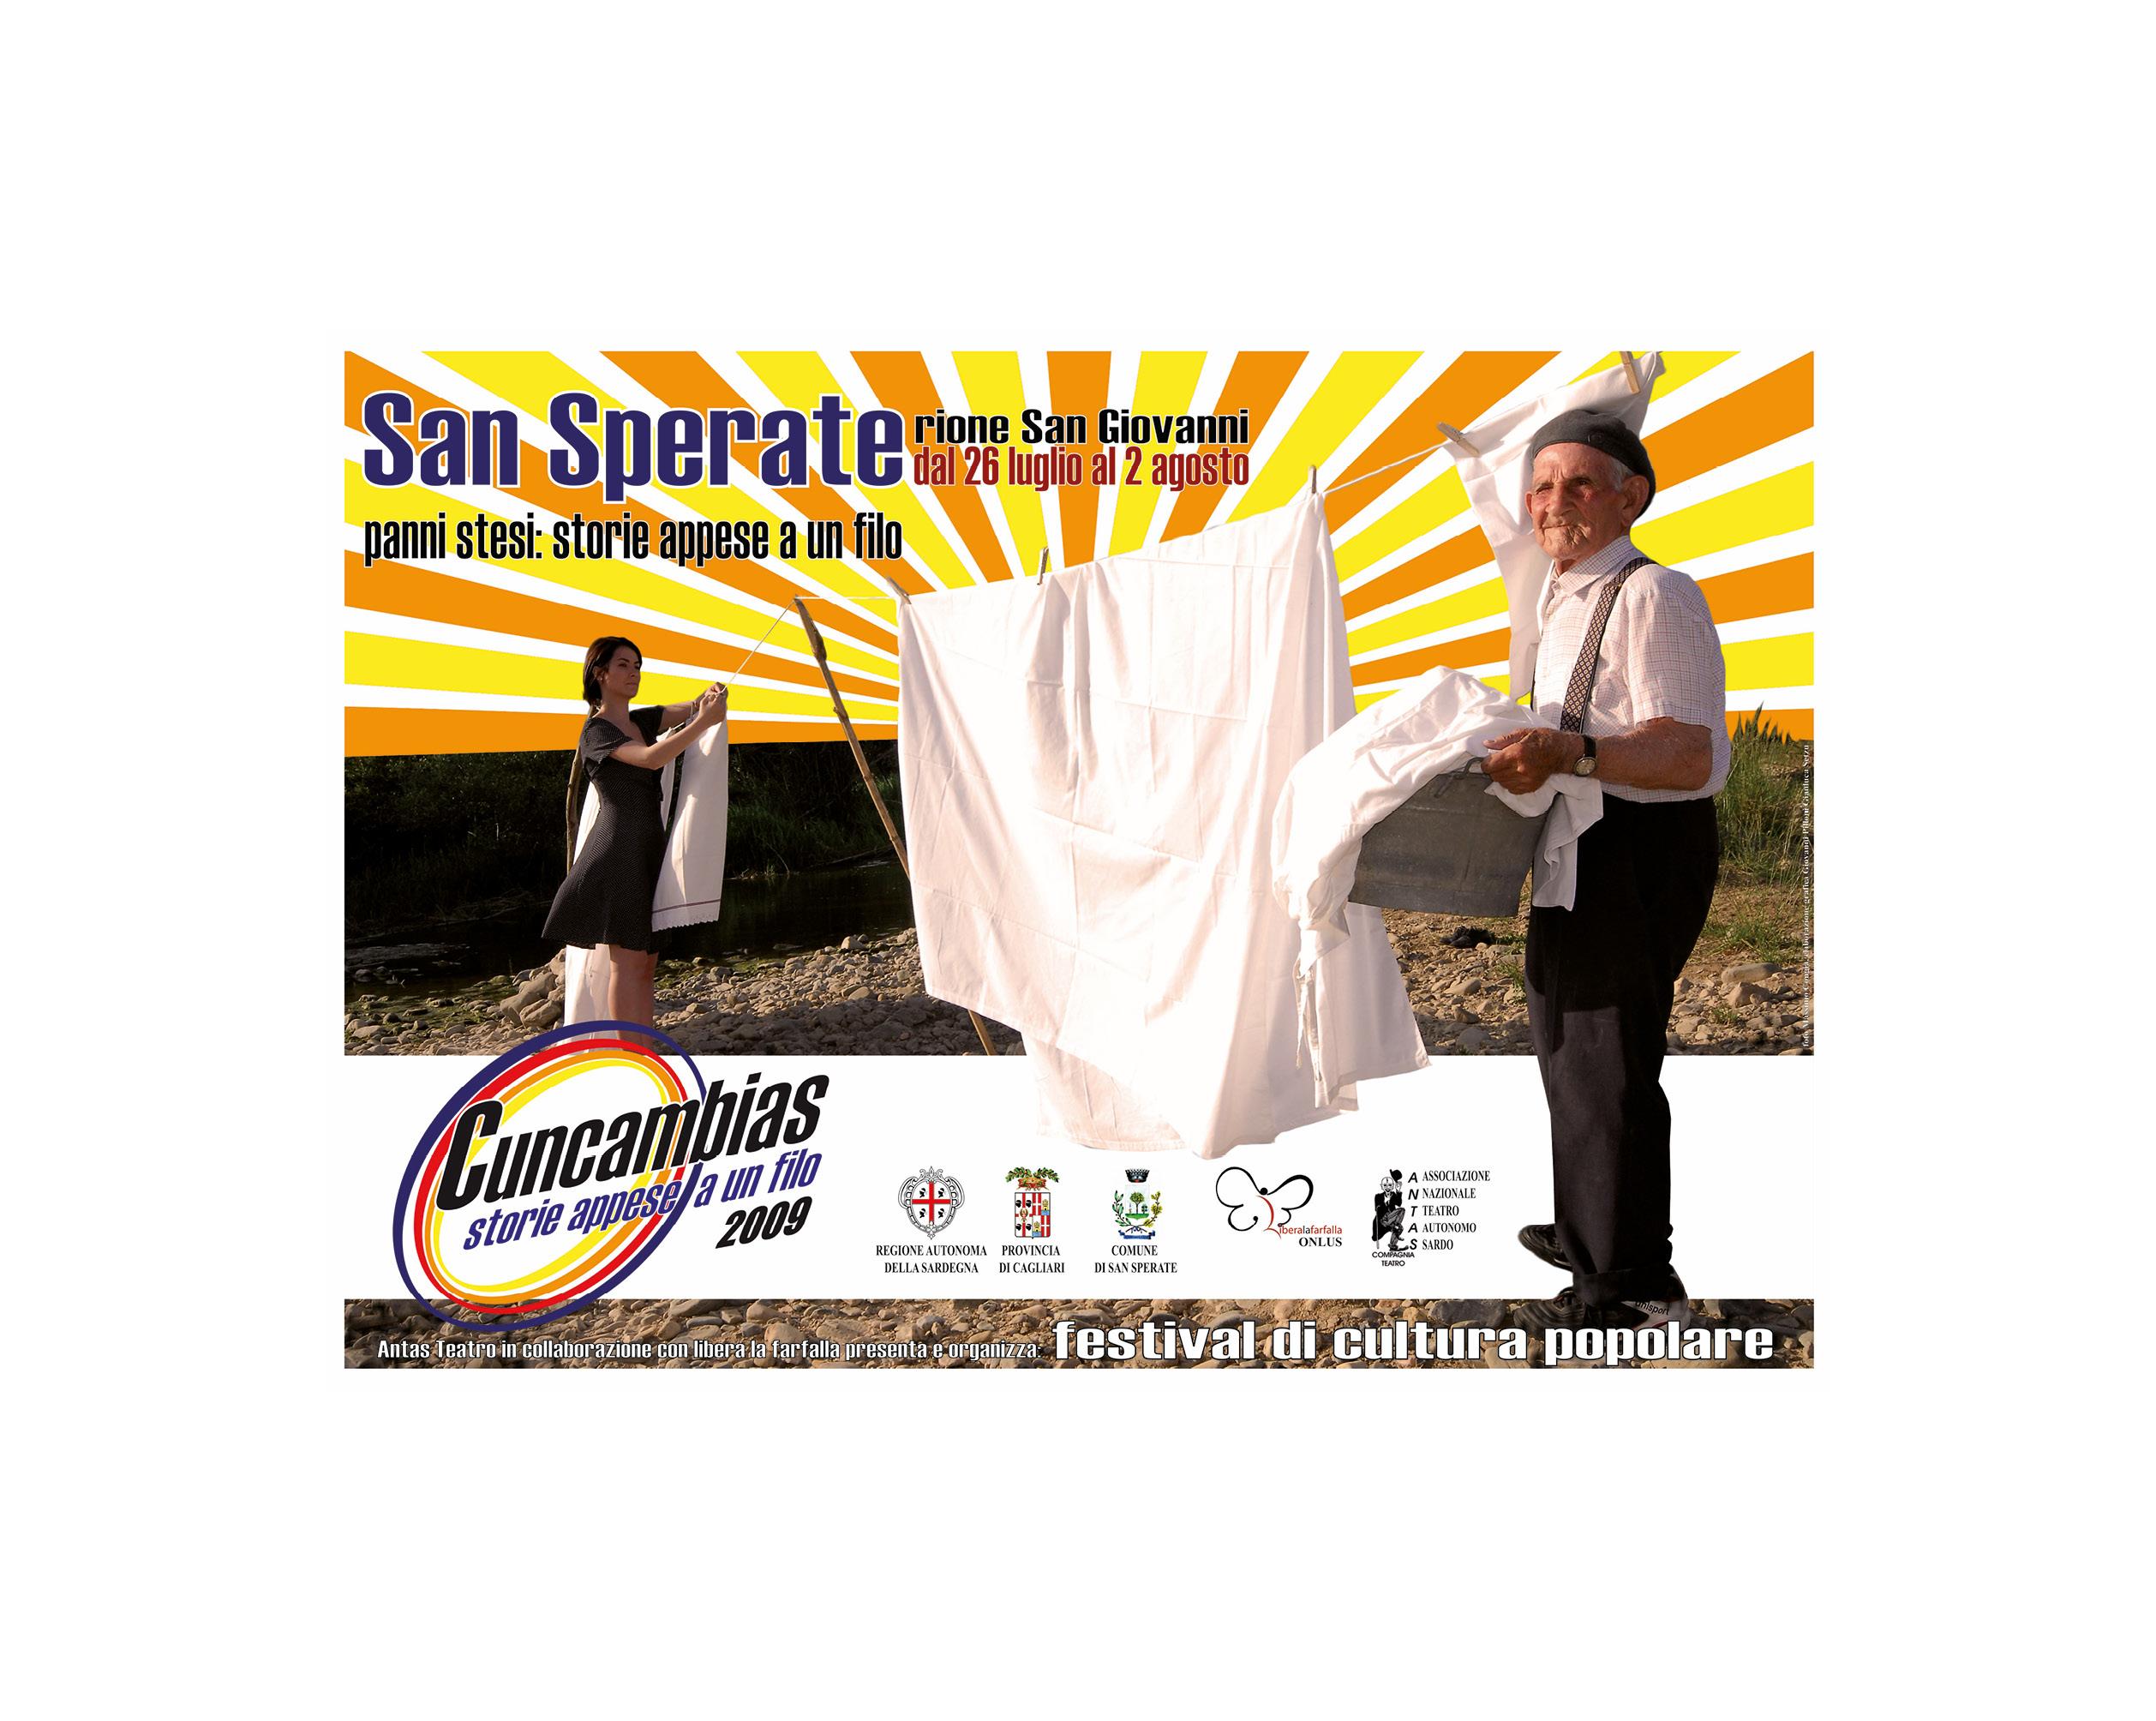 Cuncambias 2009